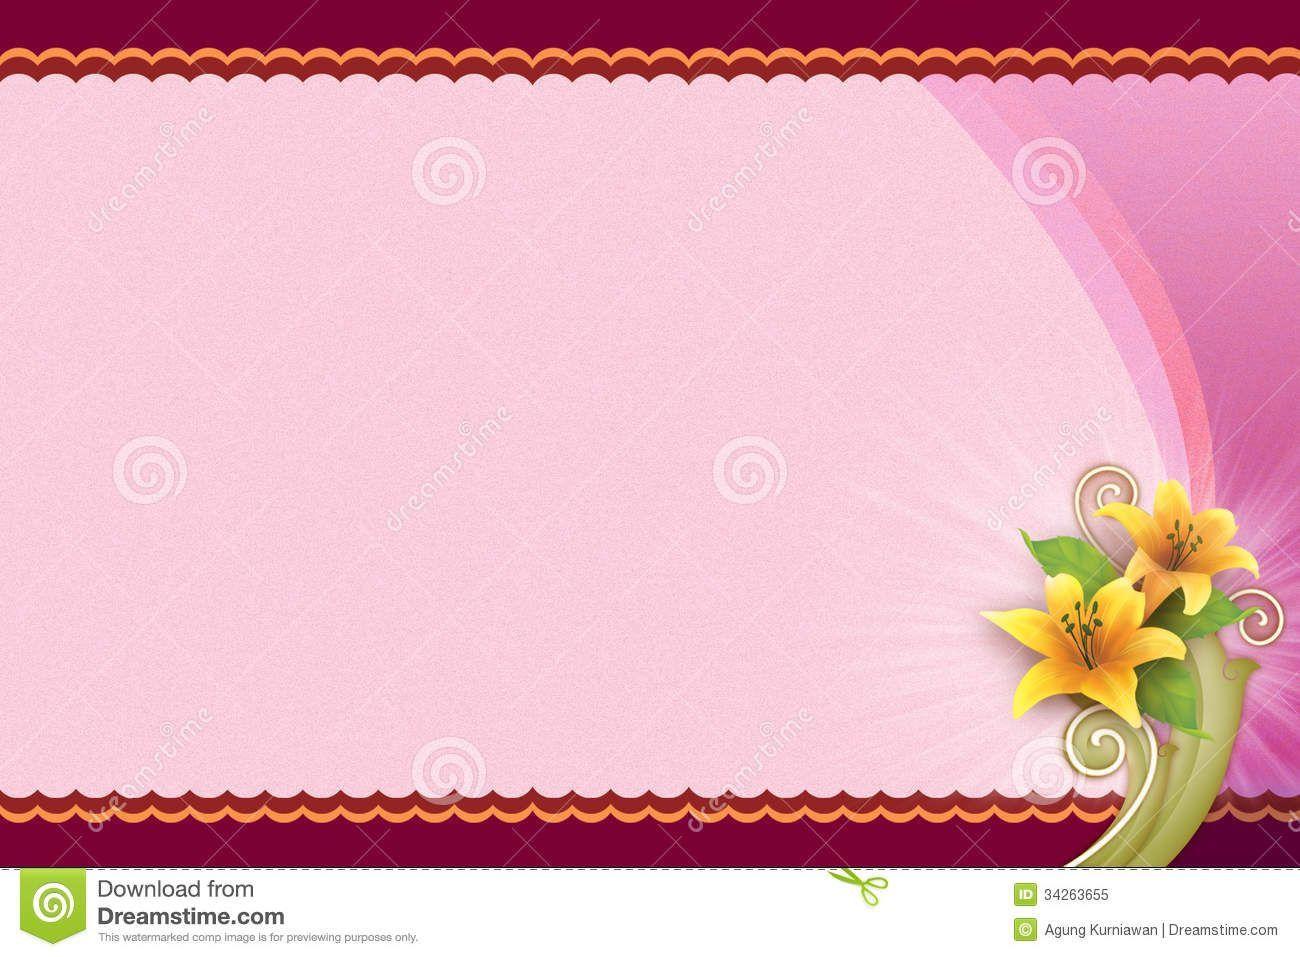 000 Fantastic Blank Birthday Card Template Idea  Word Free Printable Greeting DownloadFull